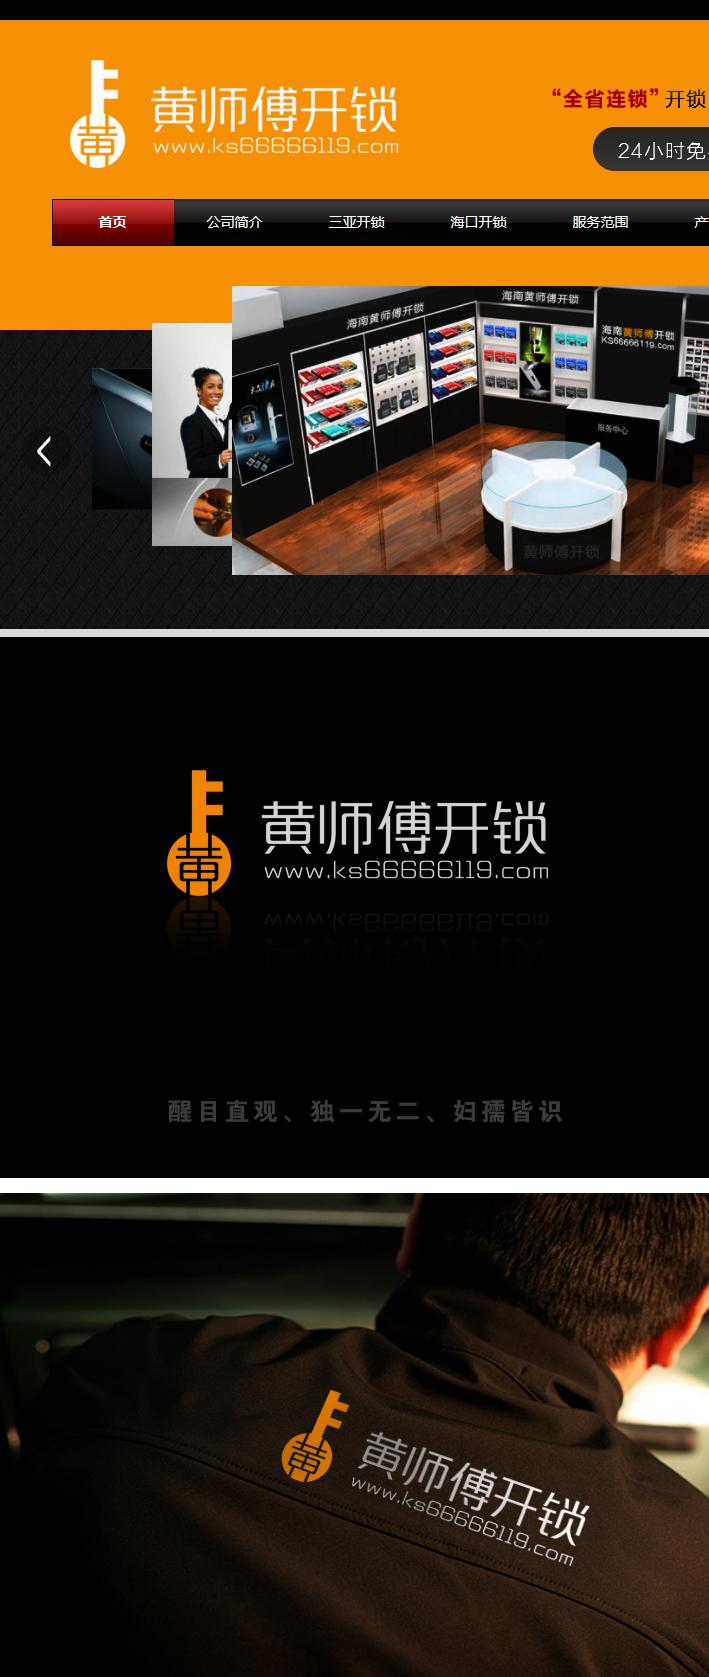 �S��傅�_�i�W站logo�O� (5天完成)_3024262_k68威客�W